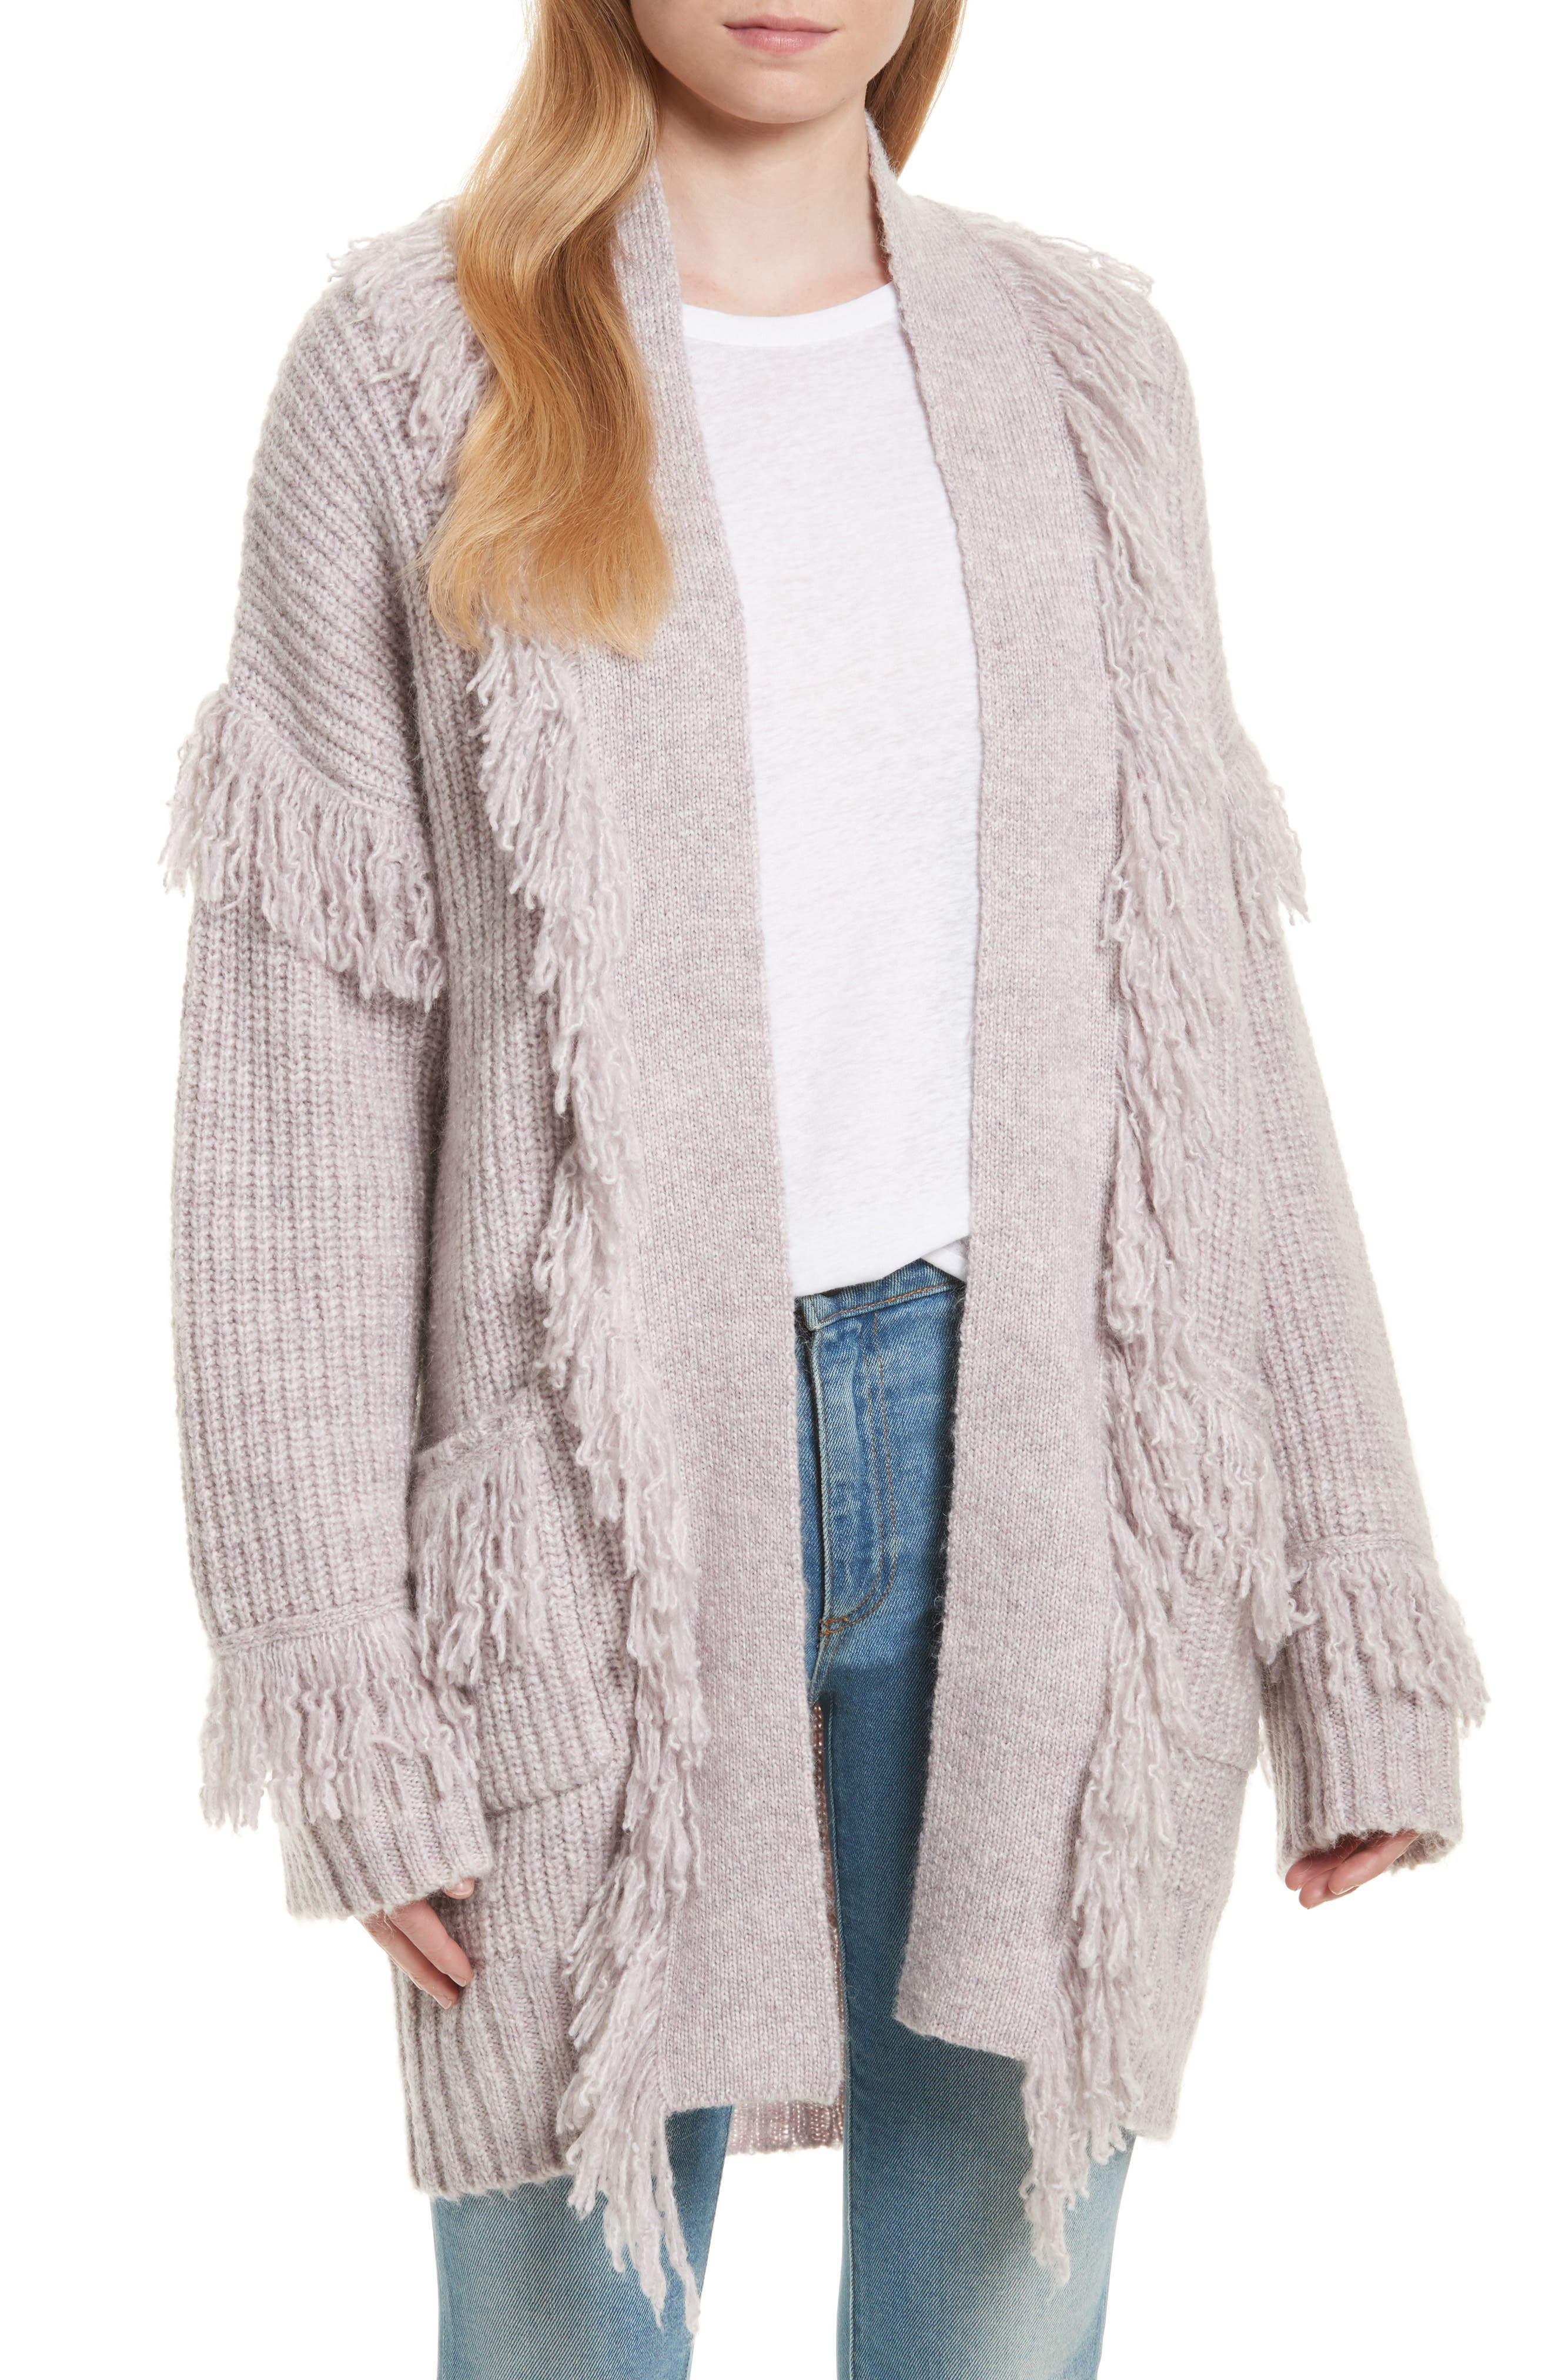 Rebecca Minkoff Berea Fringe Cardigan Sweater